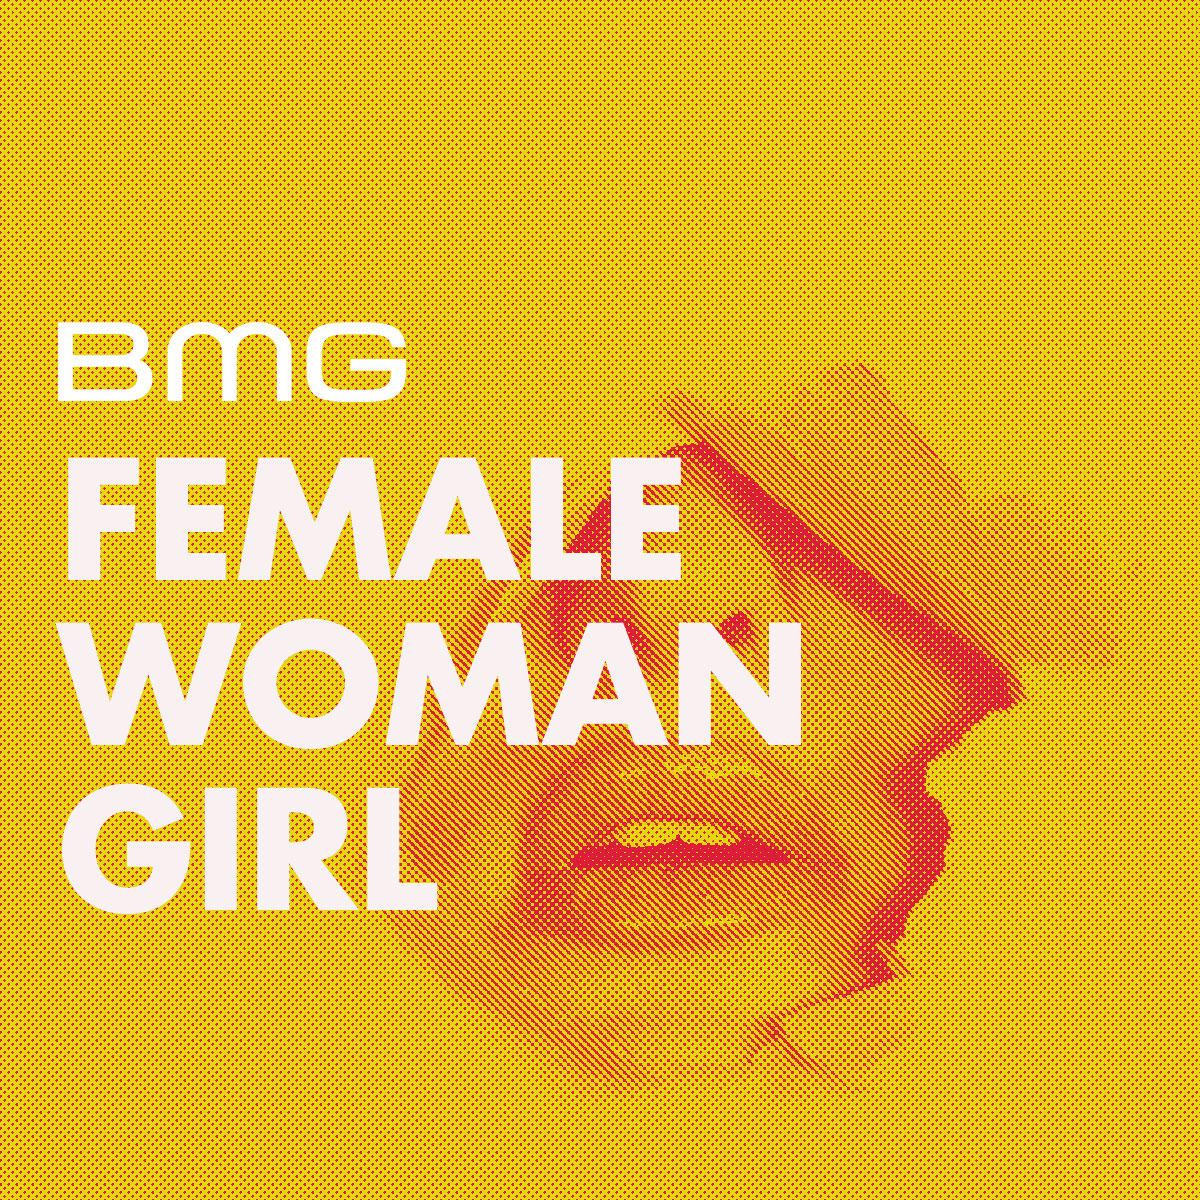 1200-x-1200-Female-Woman.jpg